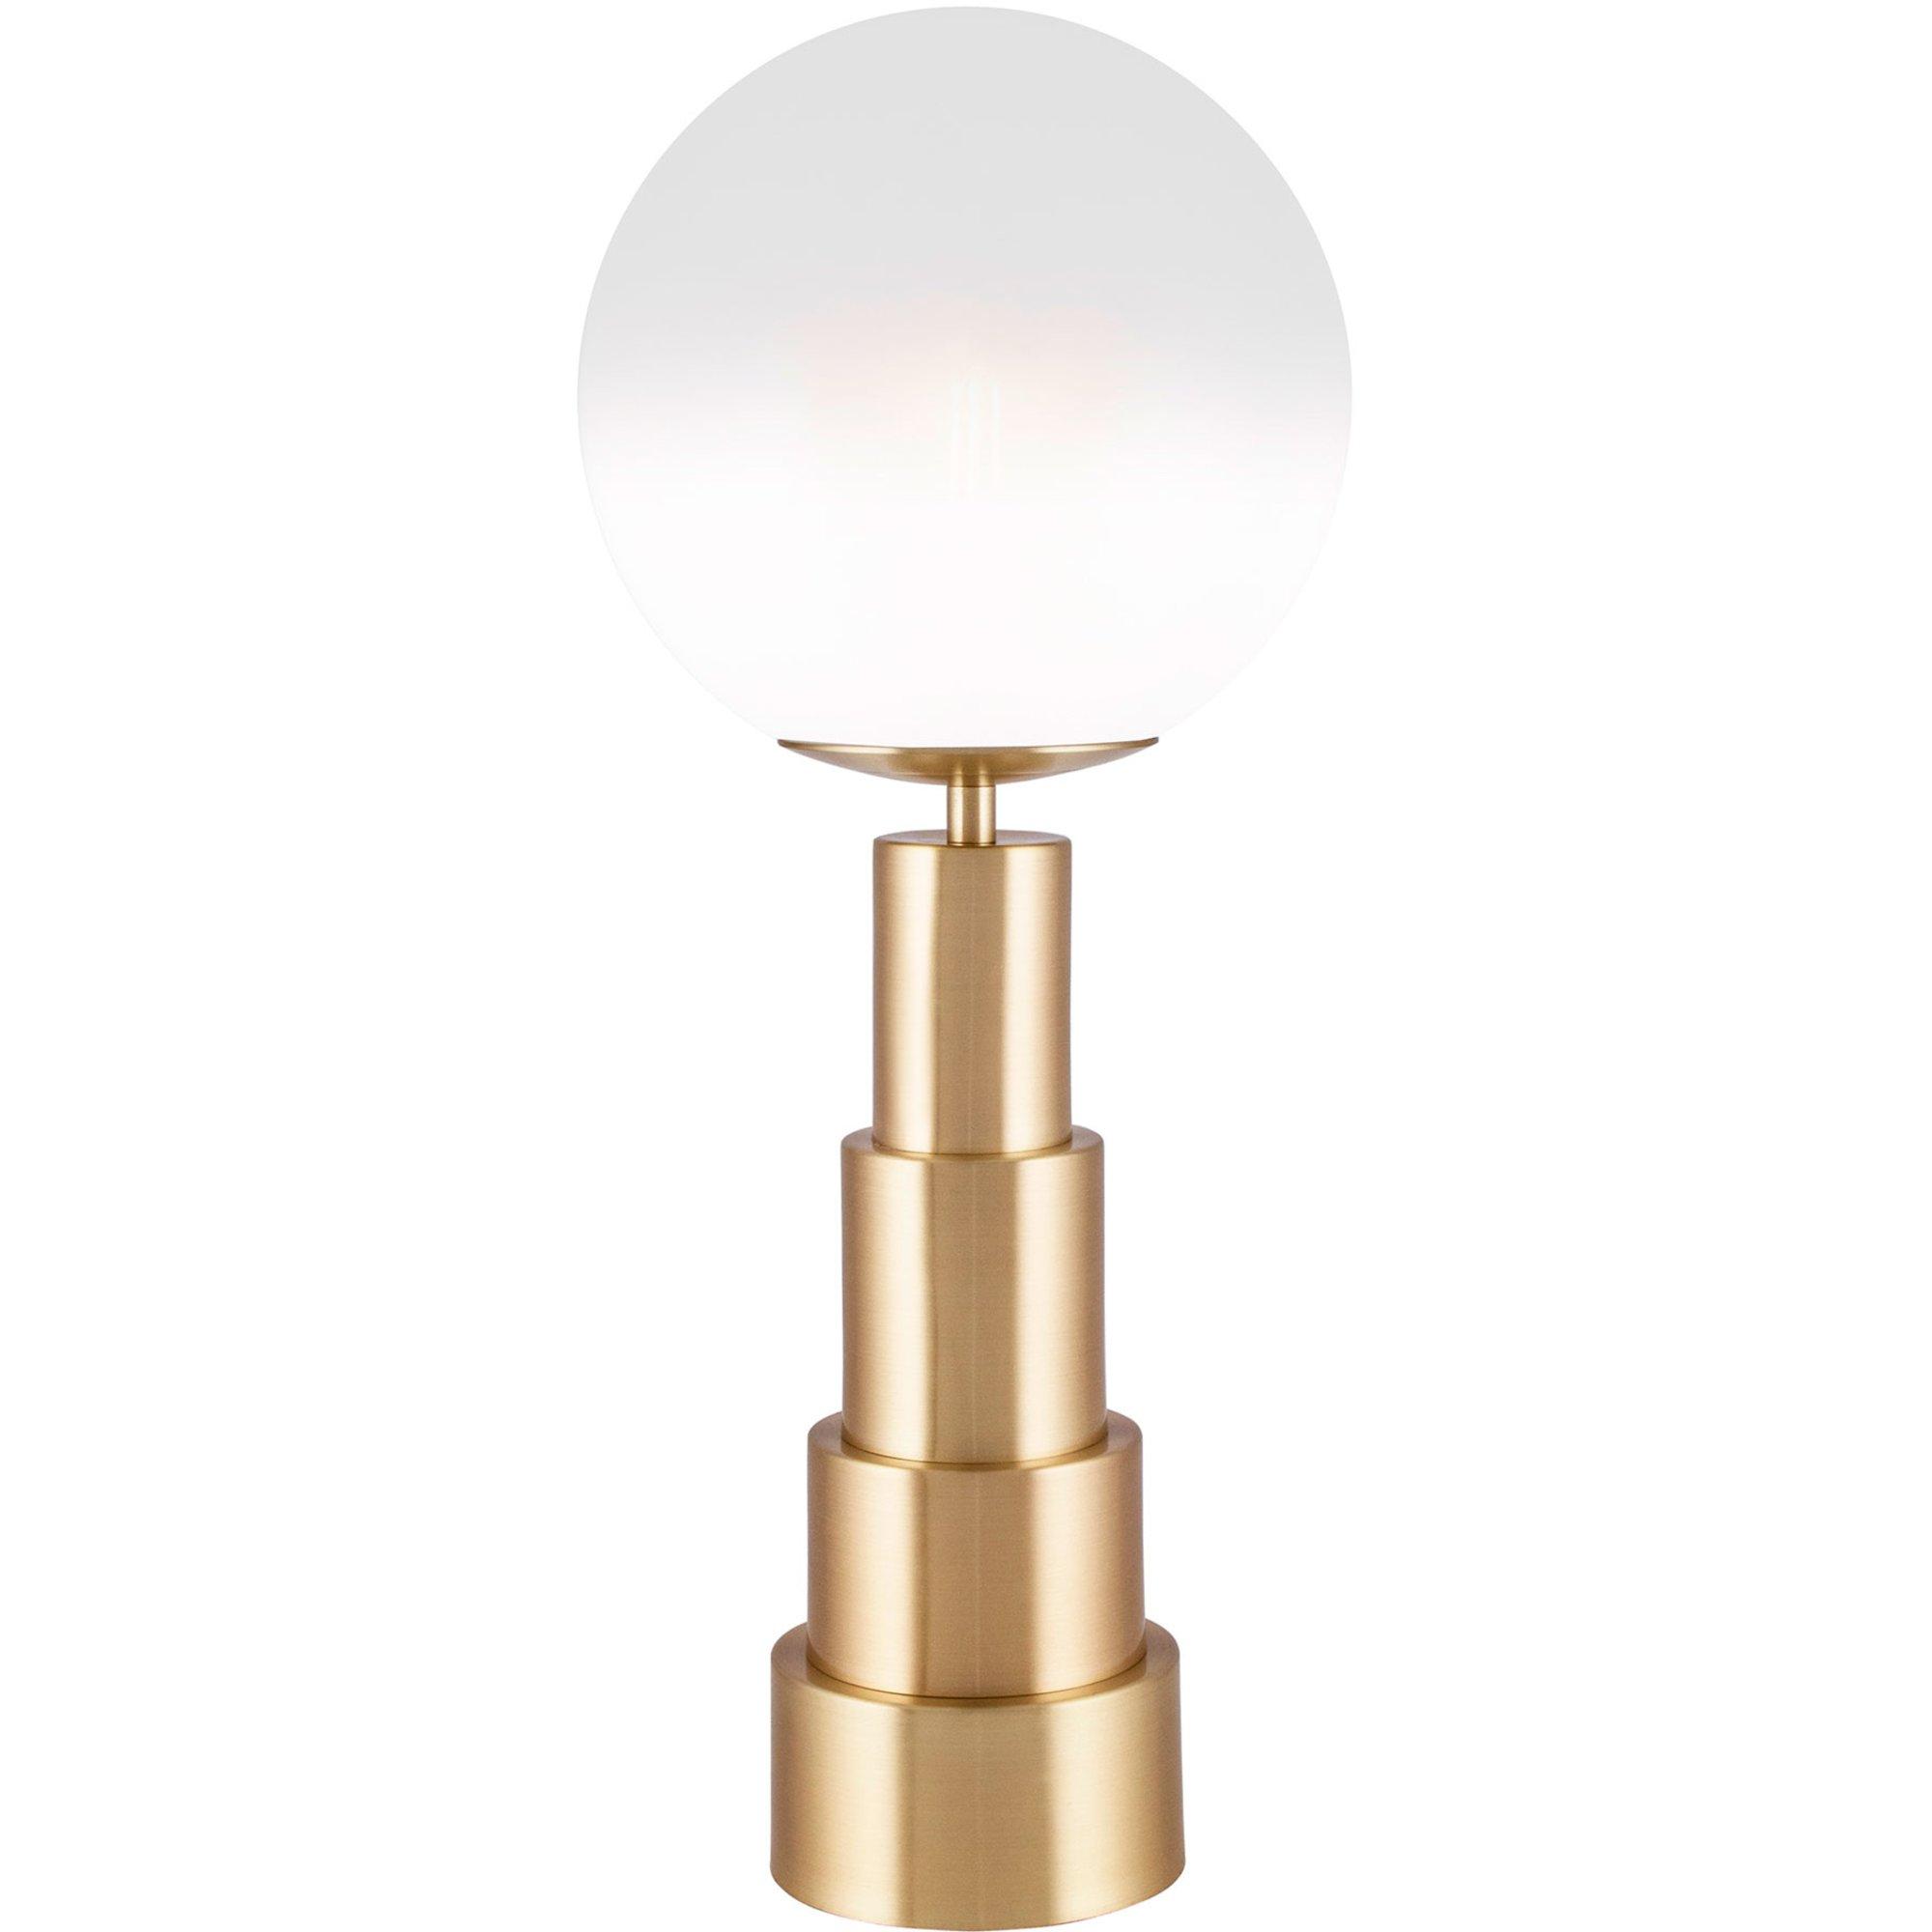 Globen Lighting Astro Bordslampa 20 cm borstad mässing